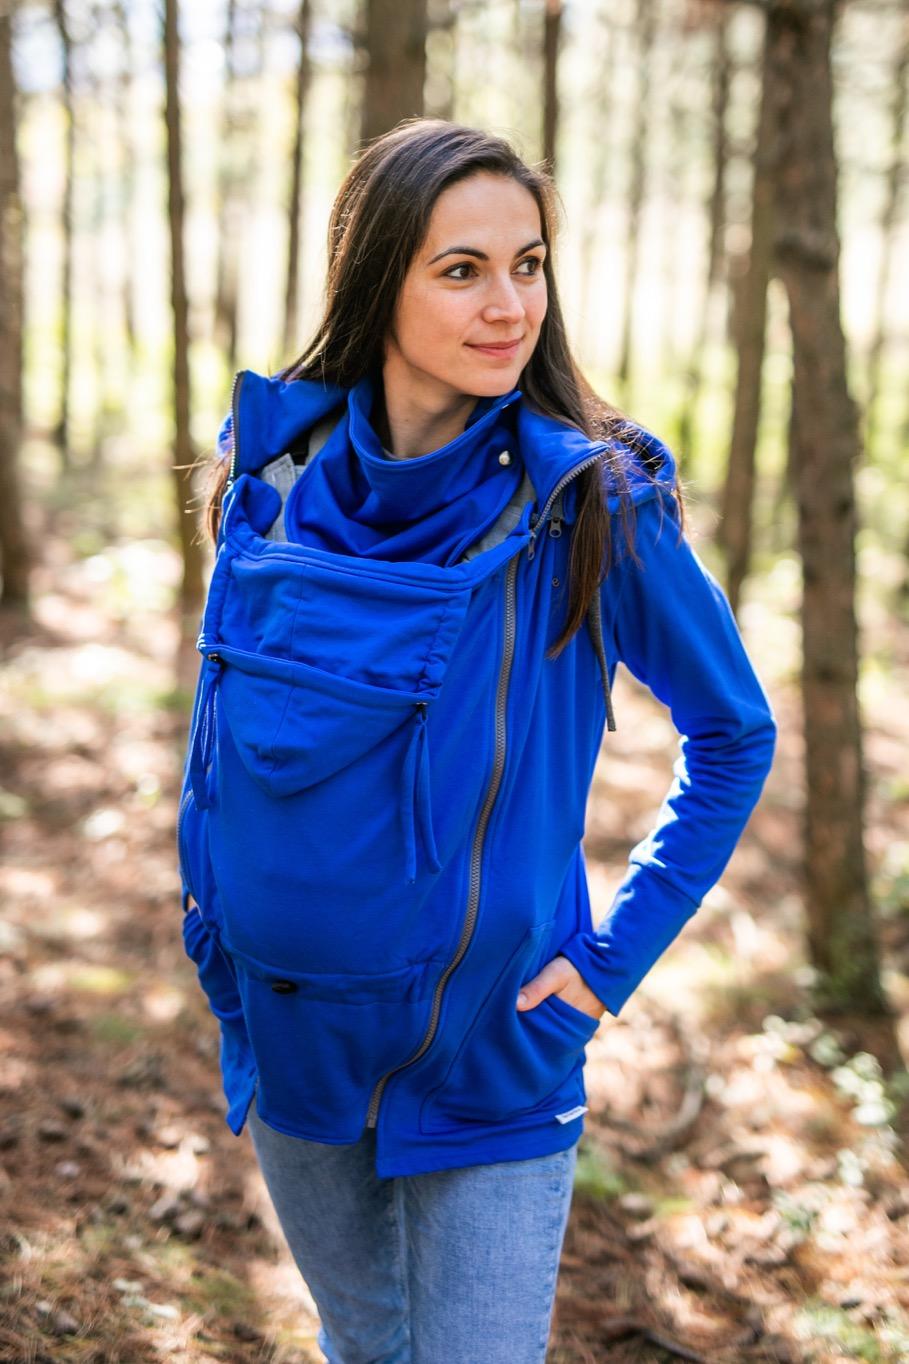 Be Lenka - Konigsblau Jogging Tragejacke l Tragen eines Sweatshirts mit 3 in 1 Trainingsanzug